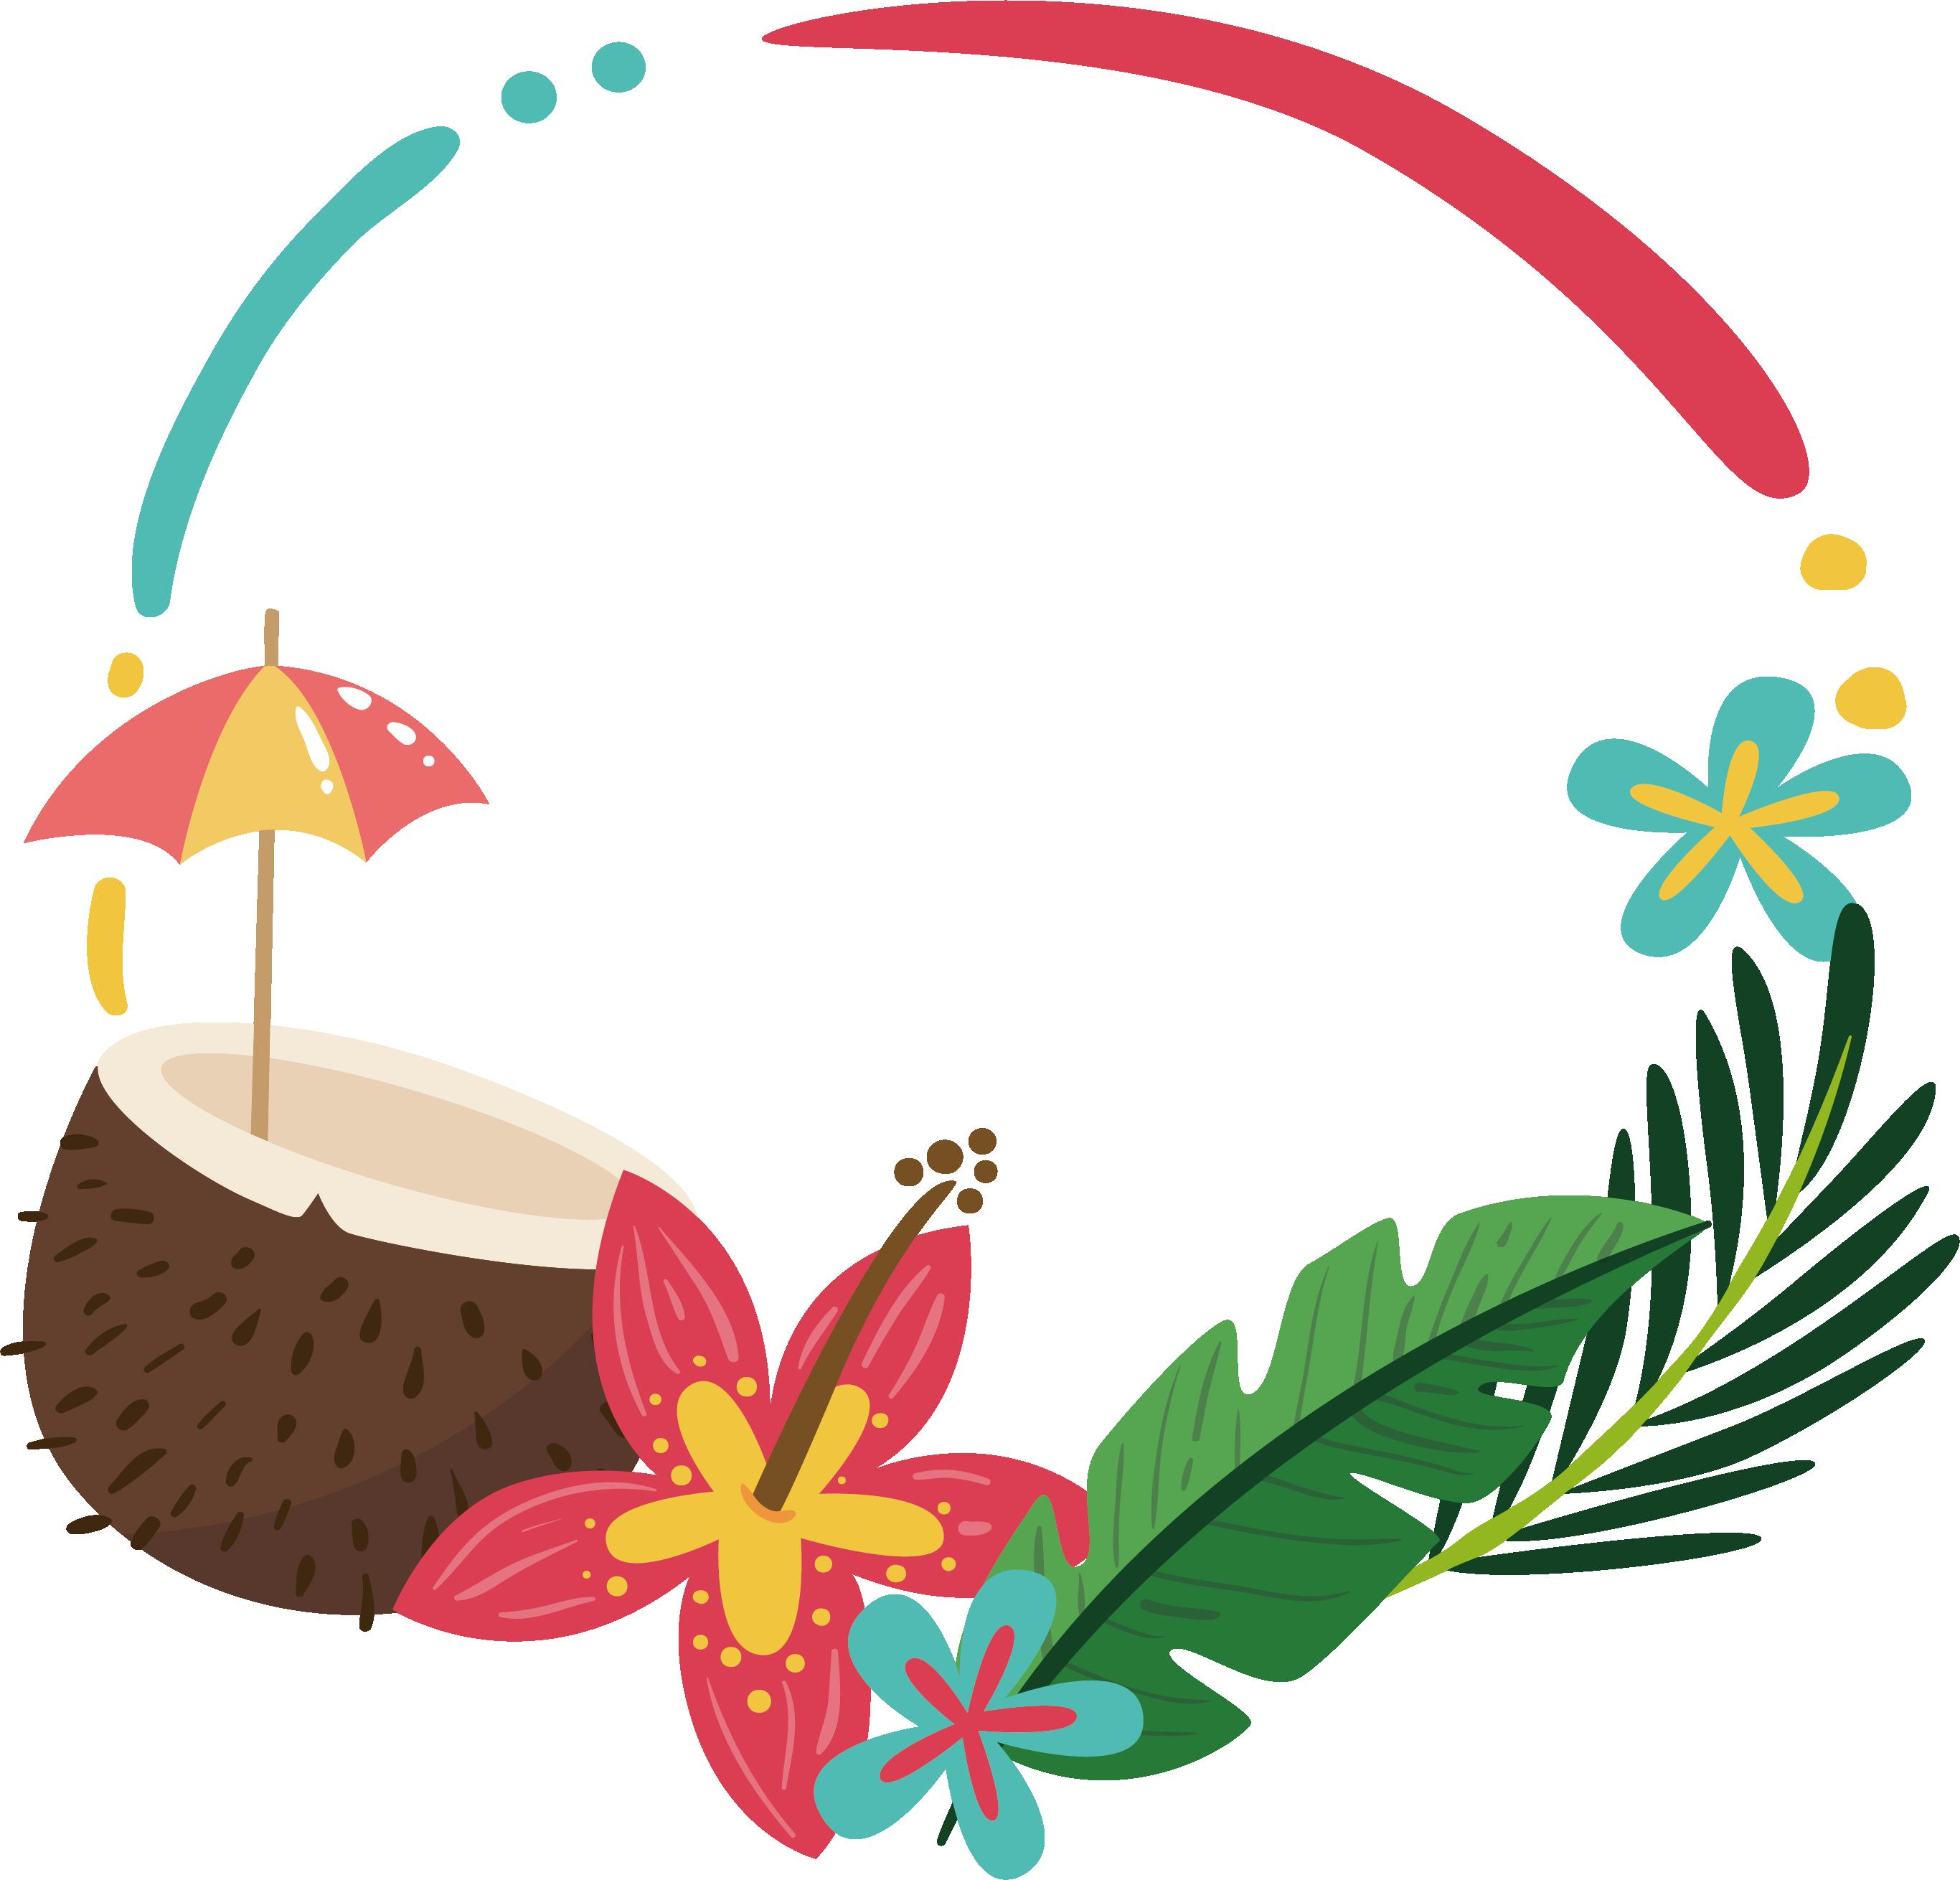 Summer flower border clipart png Clip art - Coconut palm summer border 2732*2620 transprent Png Free ... png